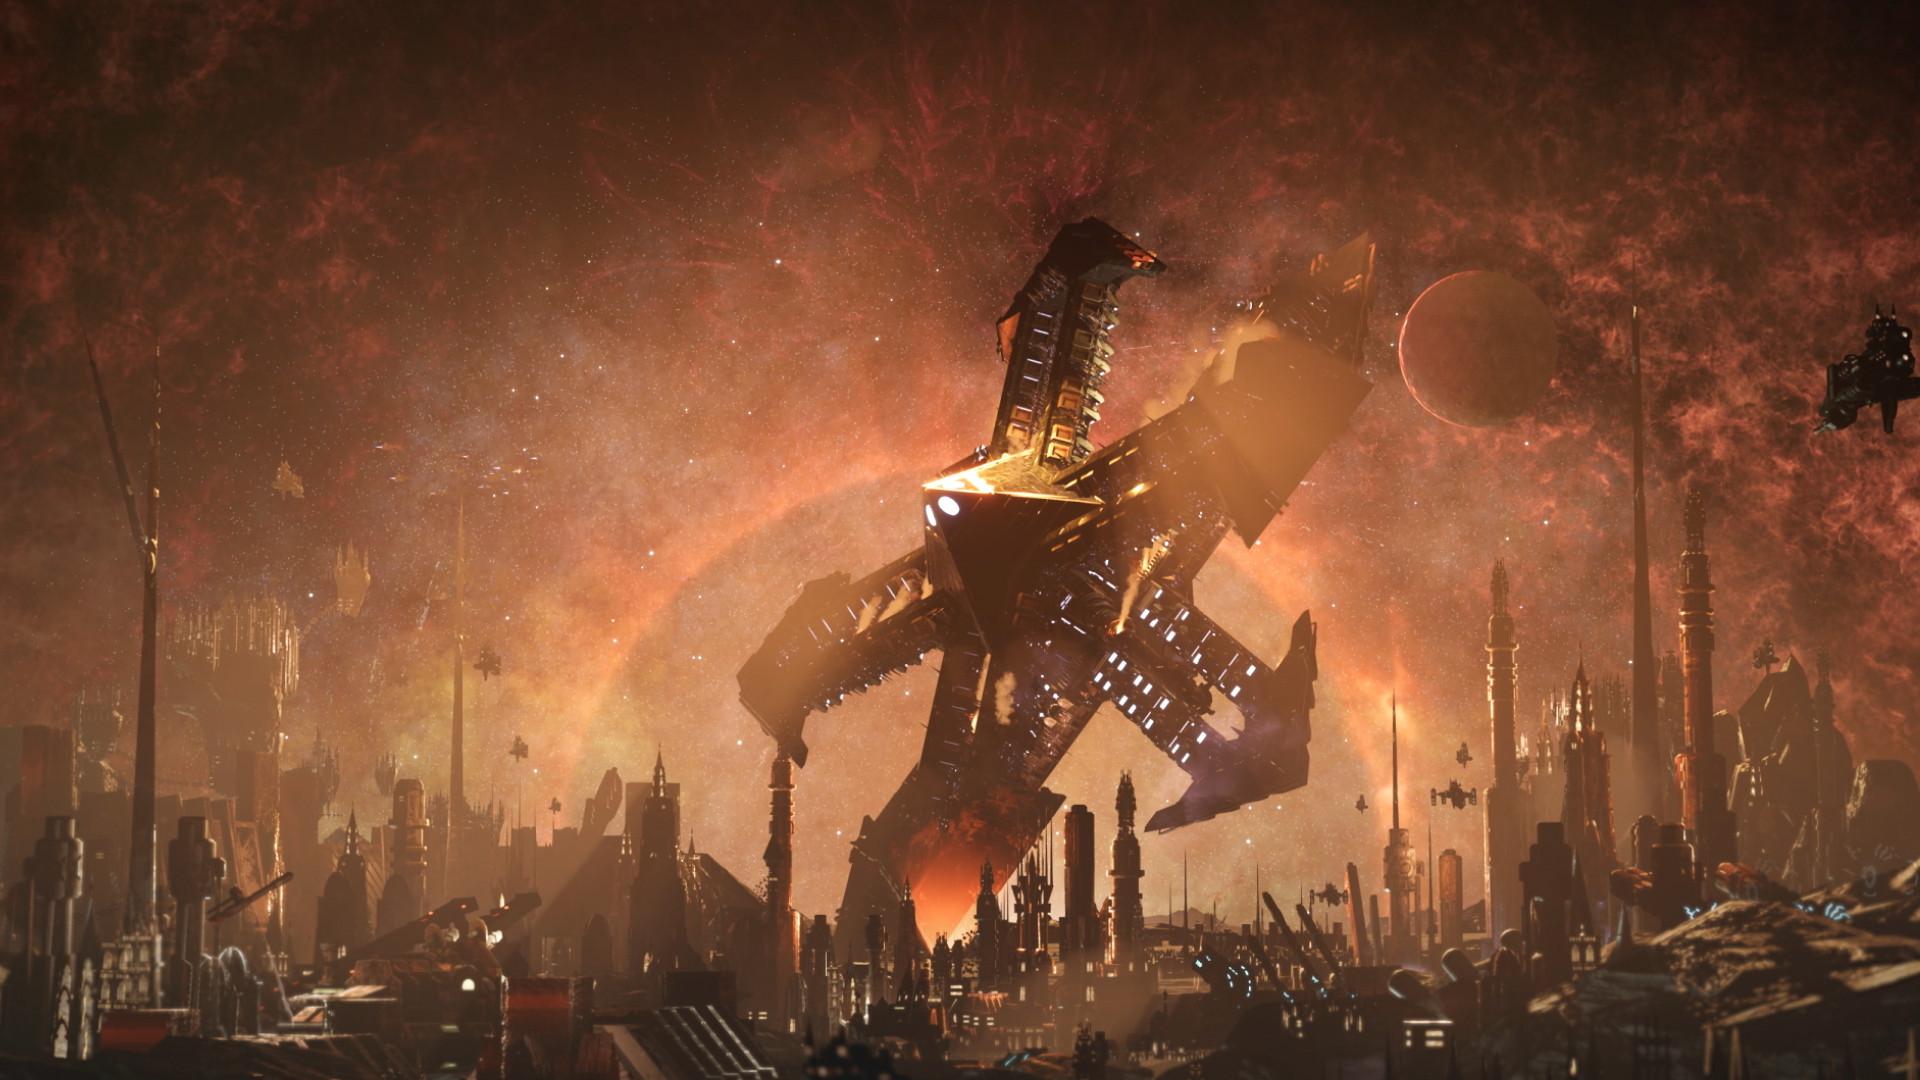 Data de lançamento do Battlefleet Gothic: Armada 2 e cronograma de testes beta confirmados